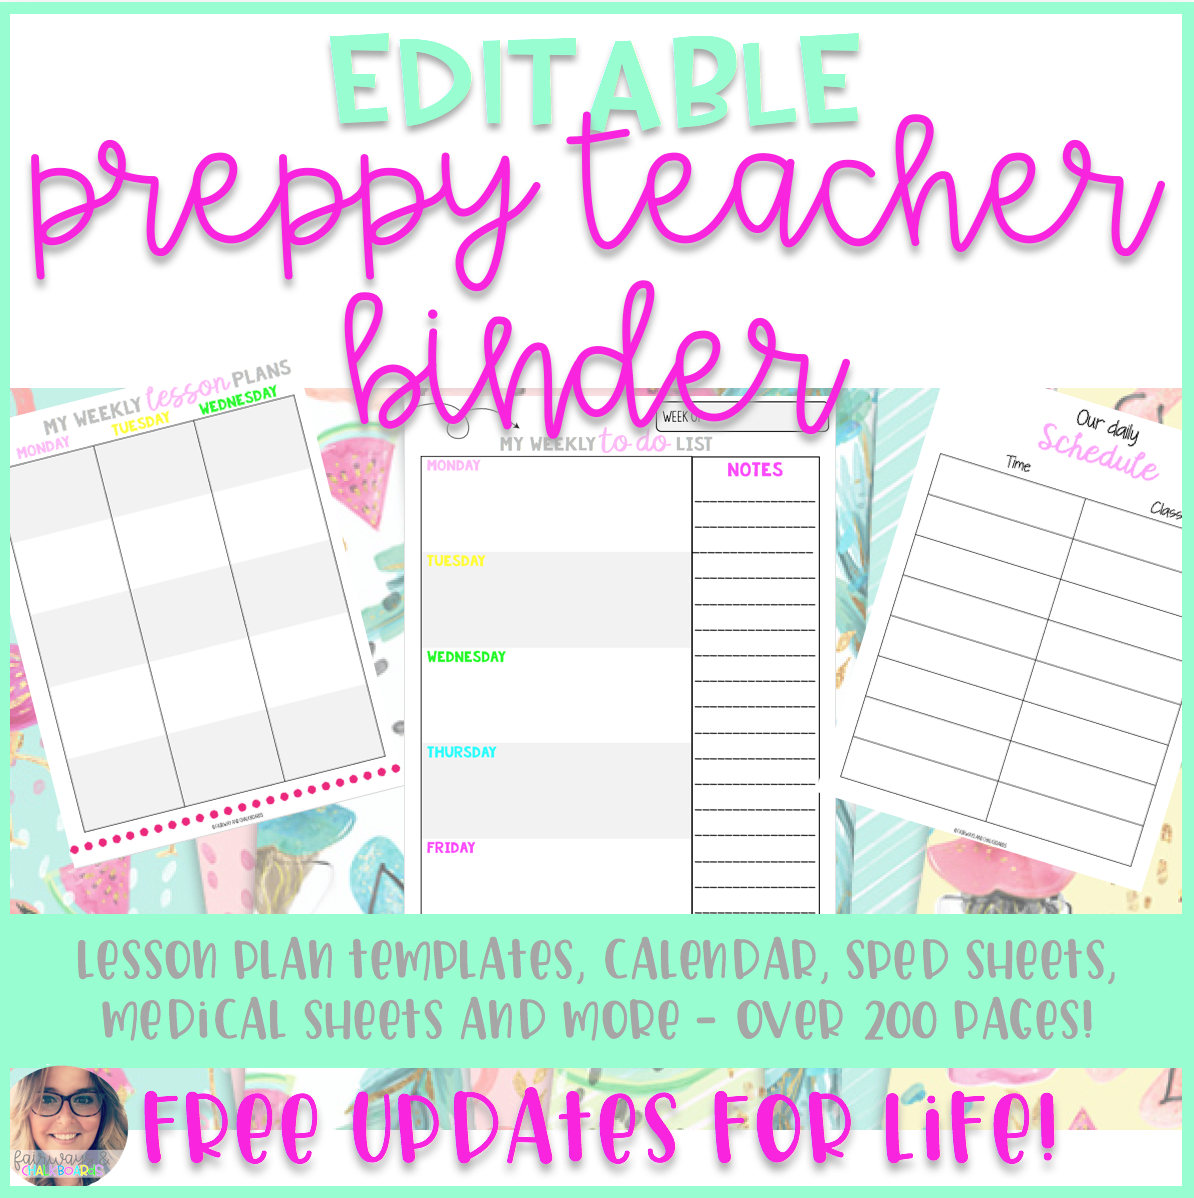 Preppy Teacher Binder - EVERYTHING YOU NEED